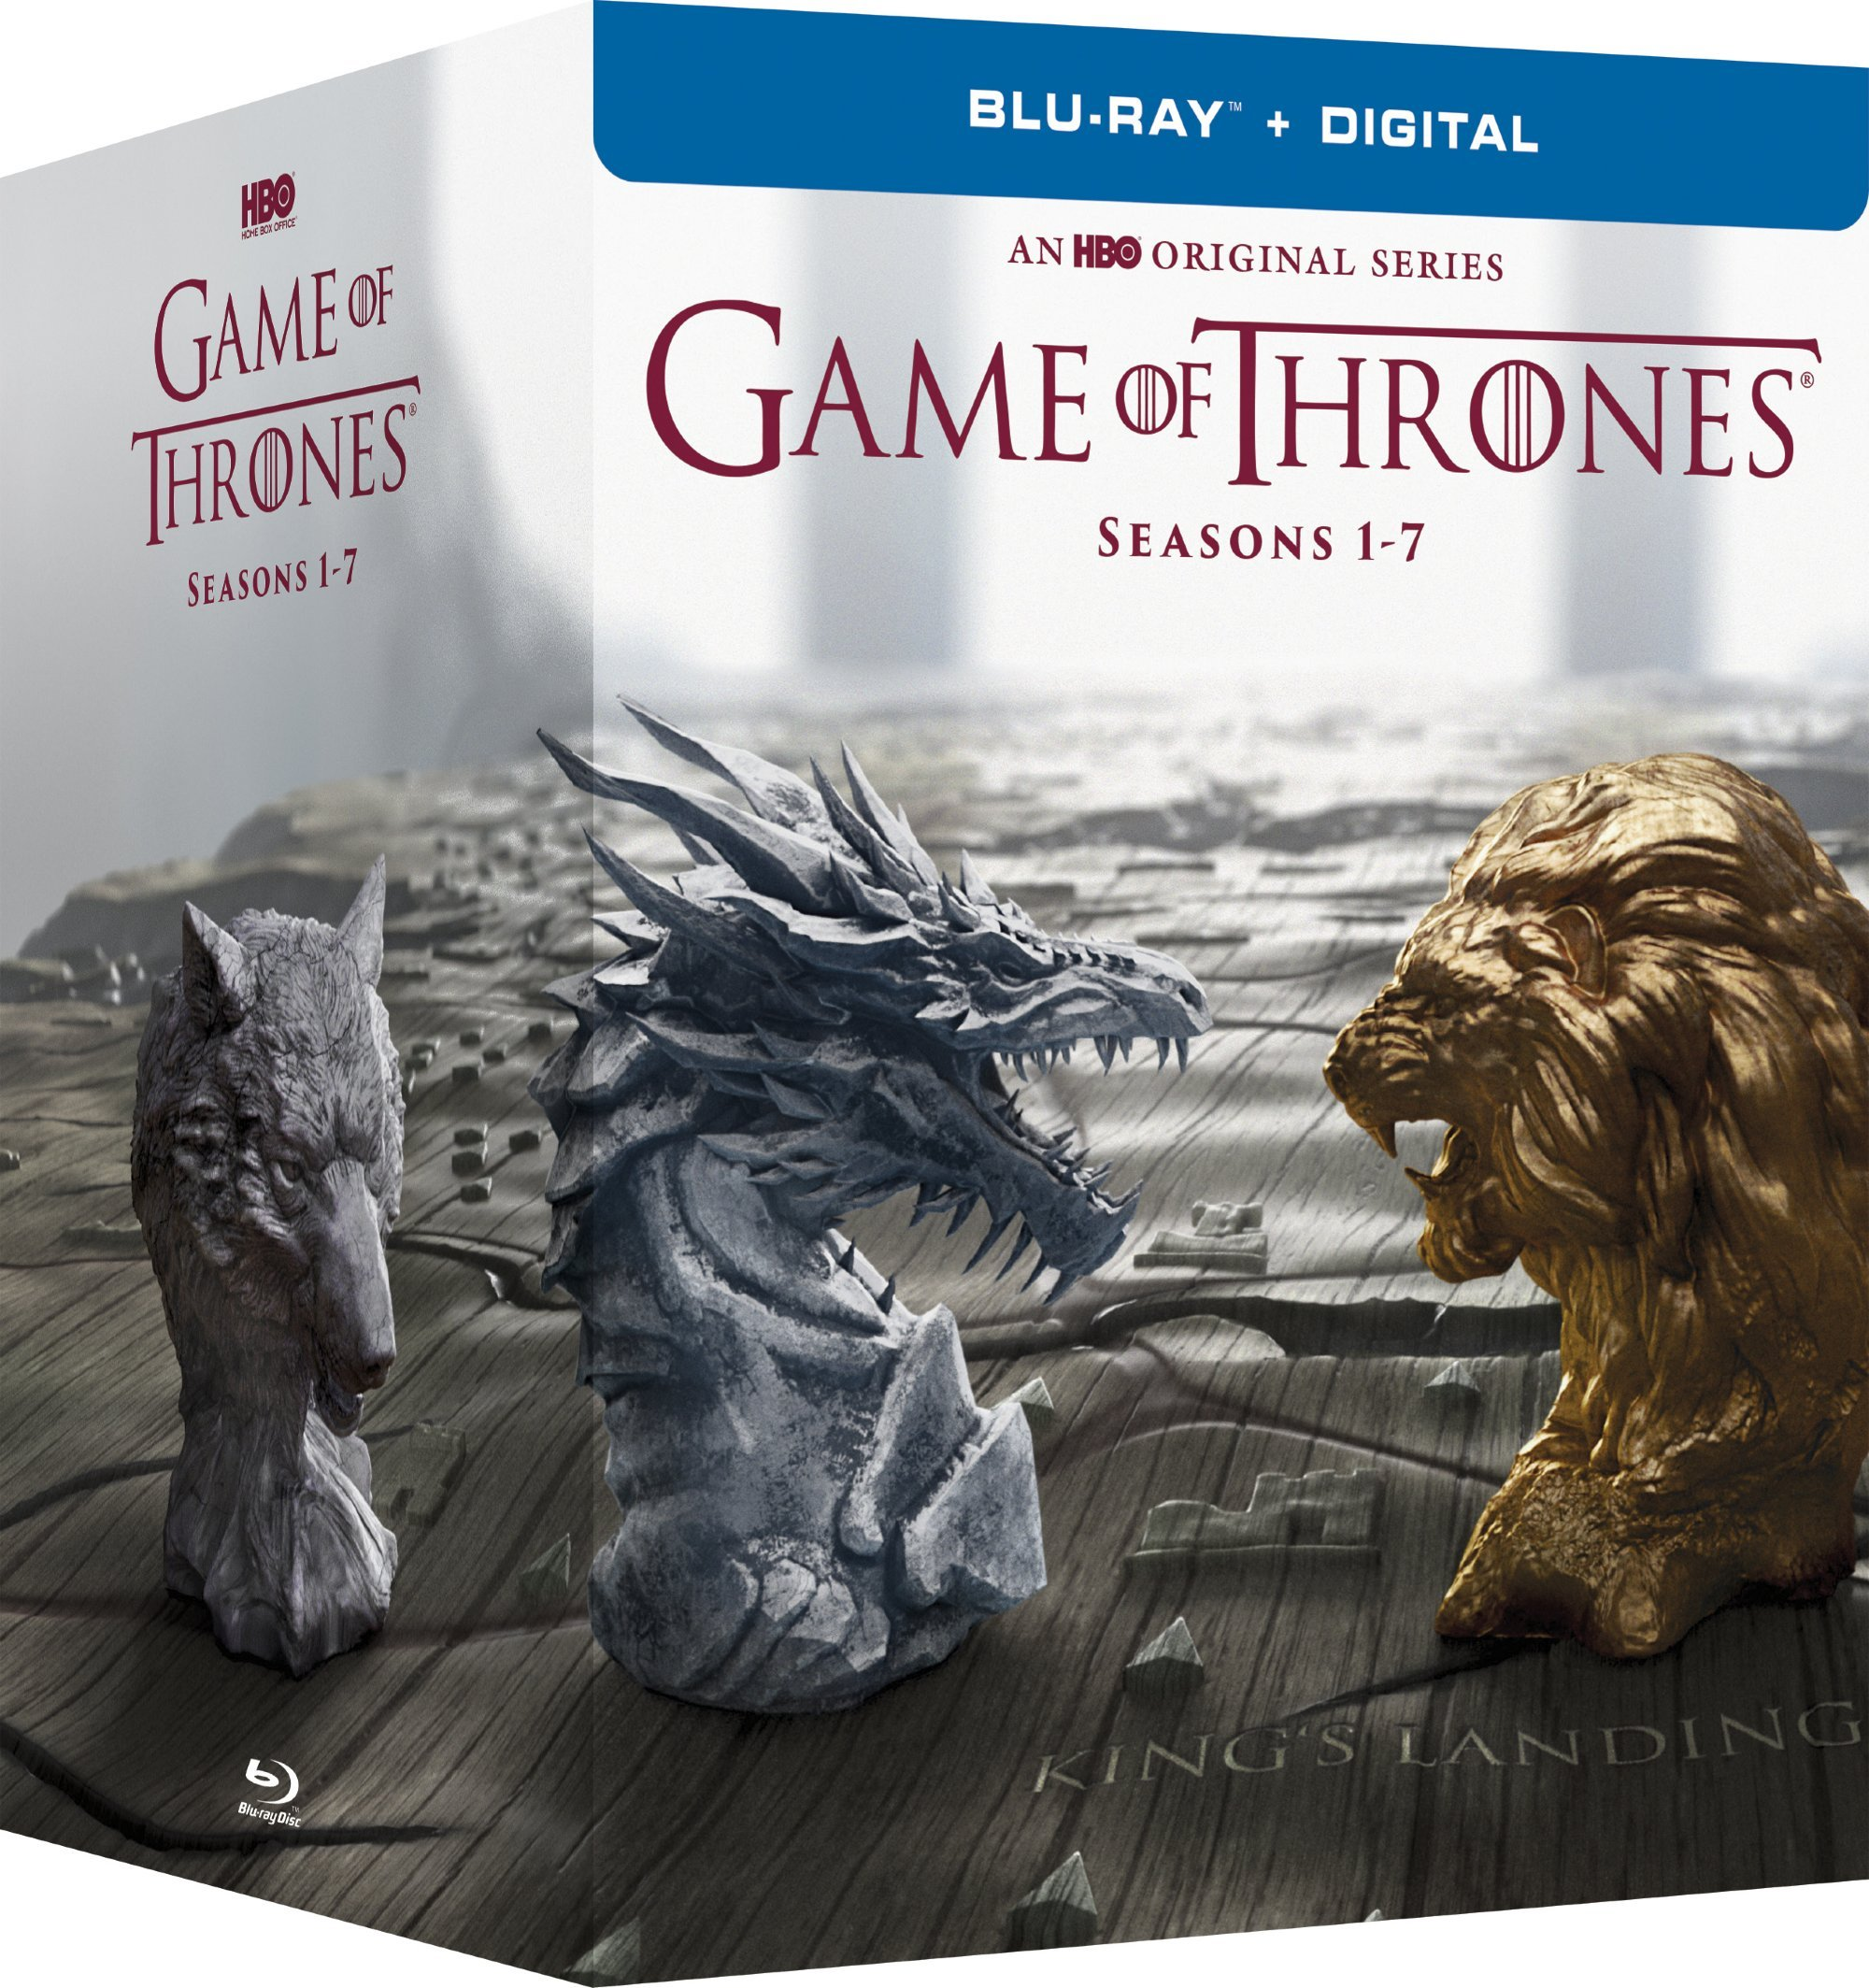 Game of Thrones: The Complete Seasons 1-7 (Boxed Set, Full Frame, Gift Set, Ultraviolet Digital Copy, Slipsleeve Packaging)